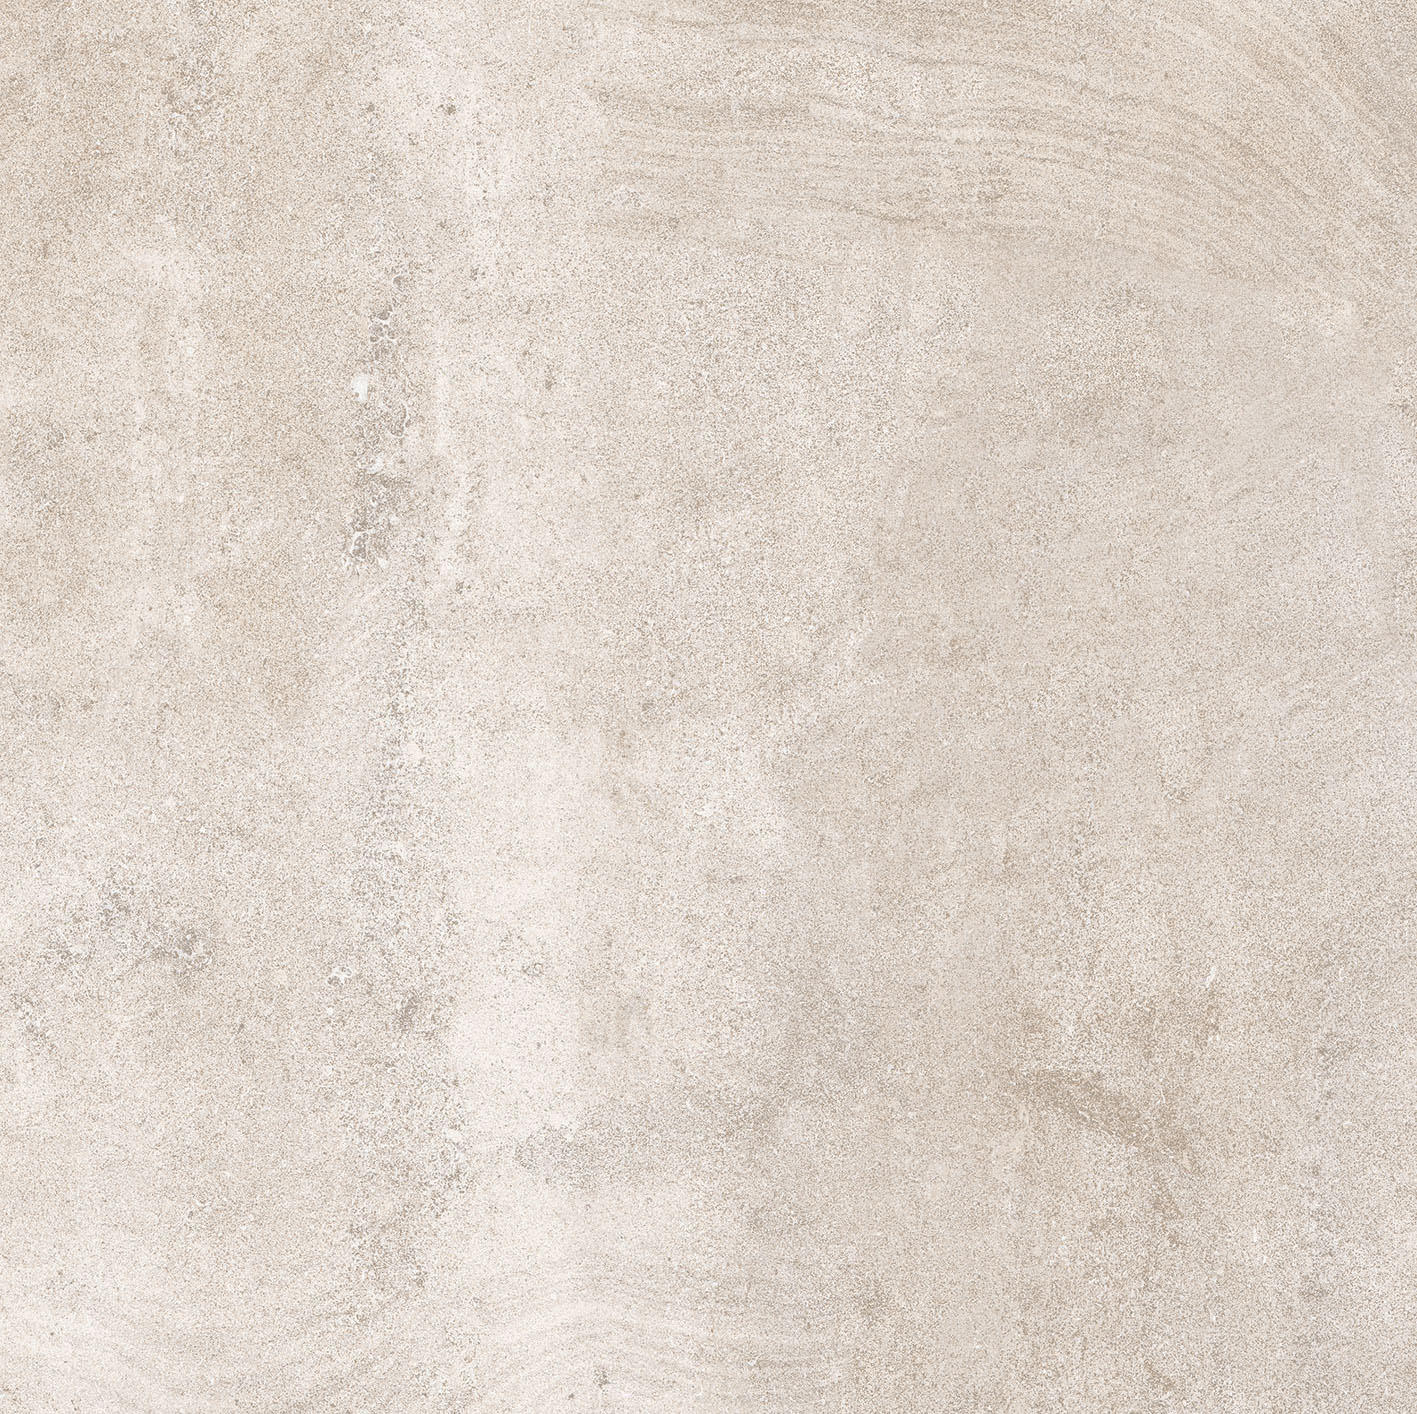 c diz bu0l floor tiles from villeroy boch fliesen. Black Bedroom Furniture Sets. Home Design Ideas